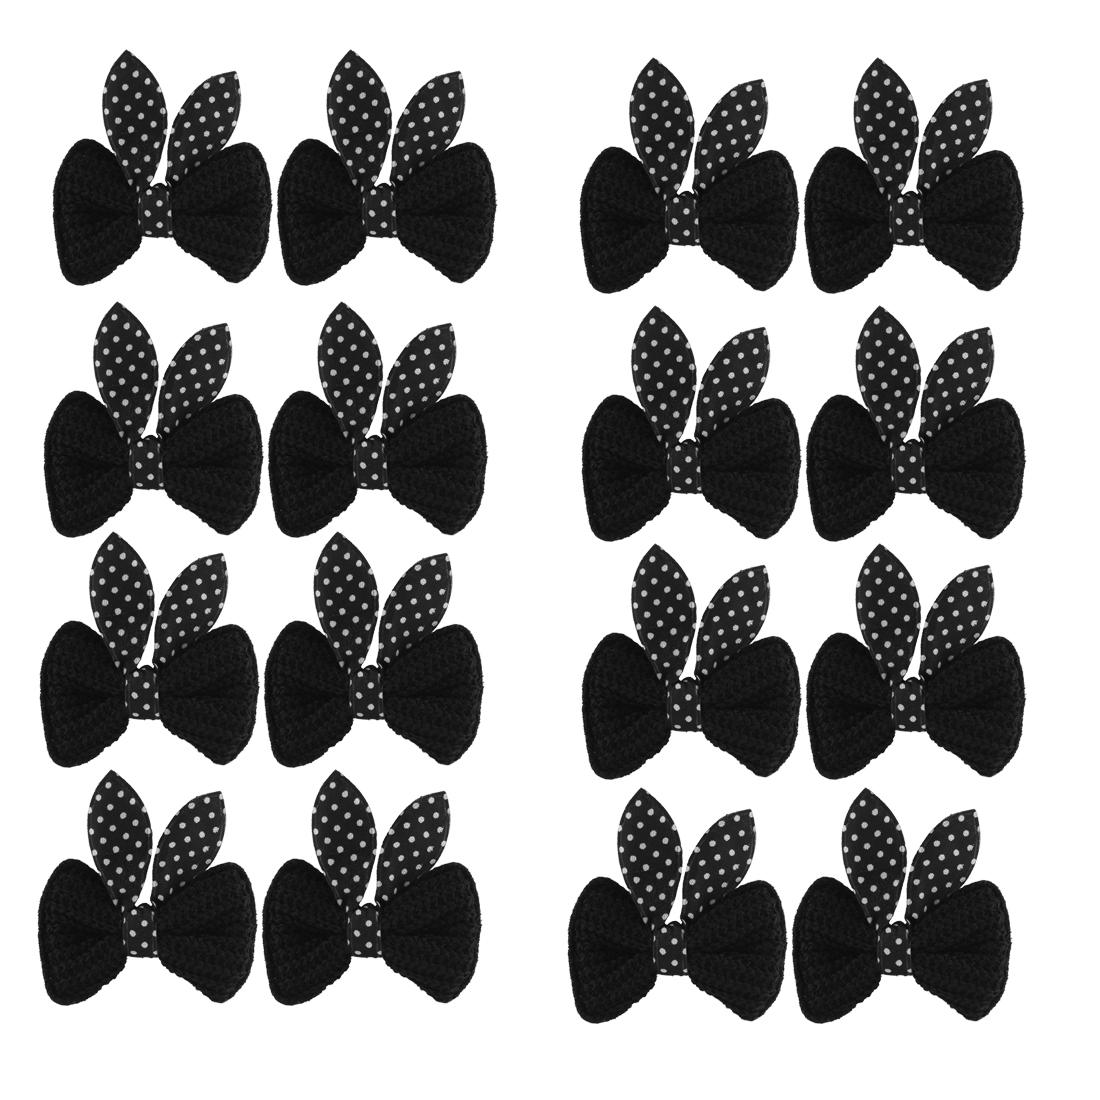 Girls Rabbit Ear Design Bow Alligator Hair Clip Barrette 8 Pairs Black